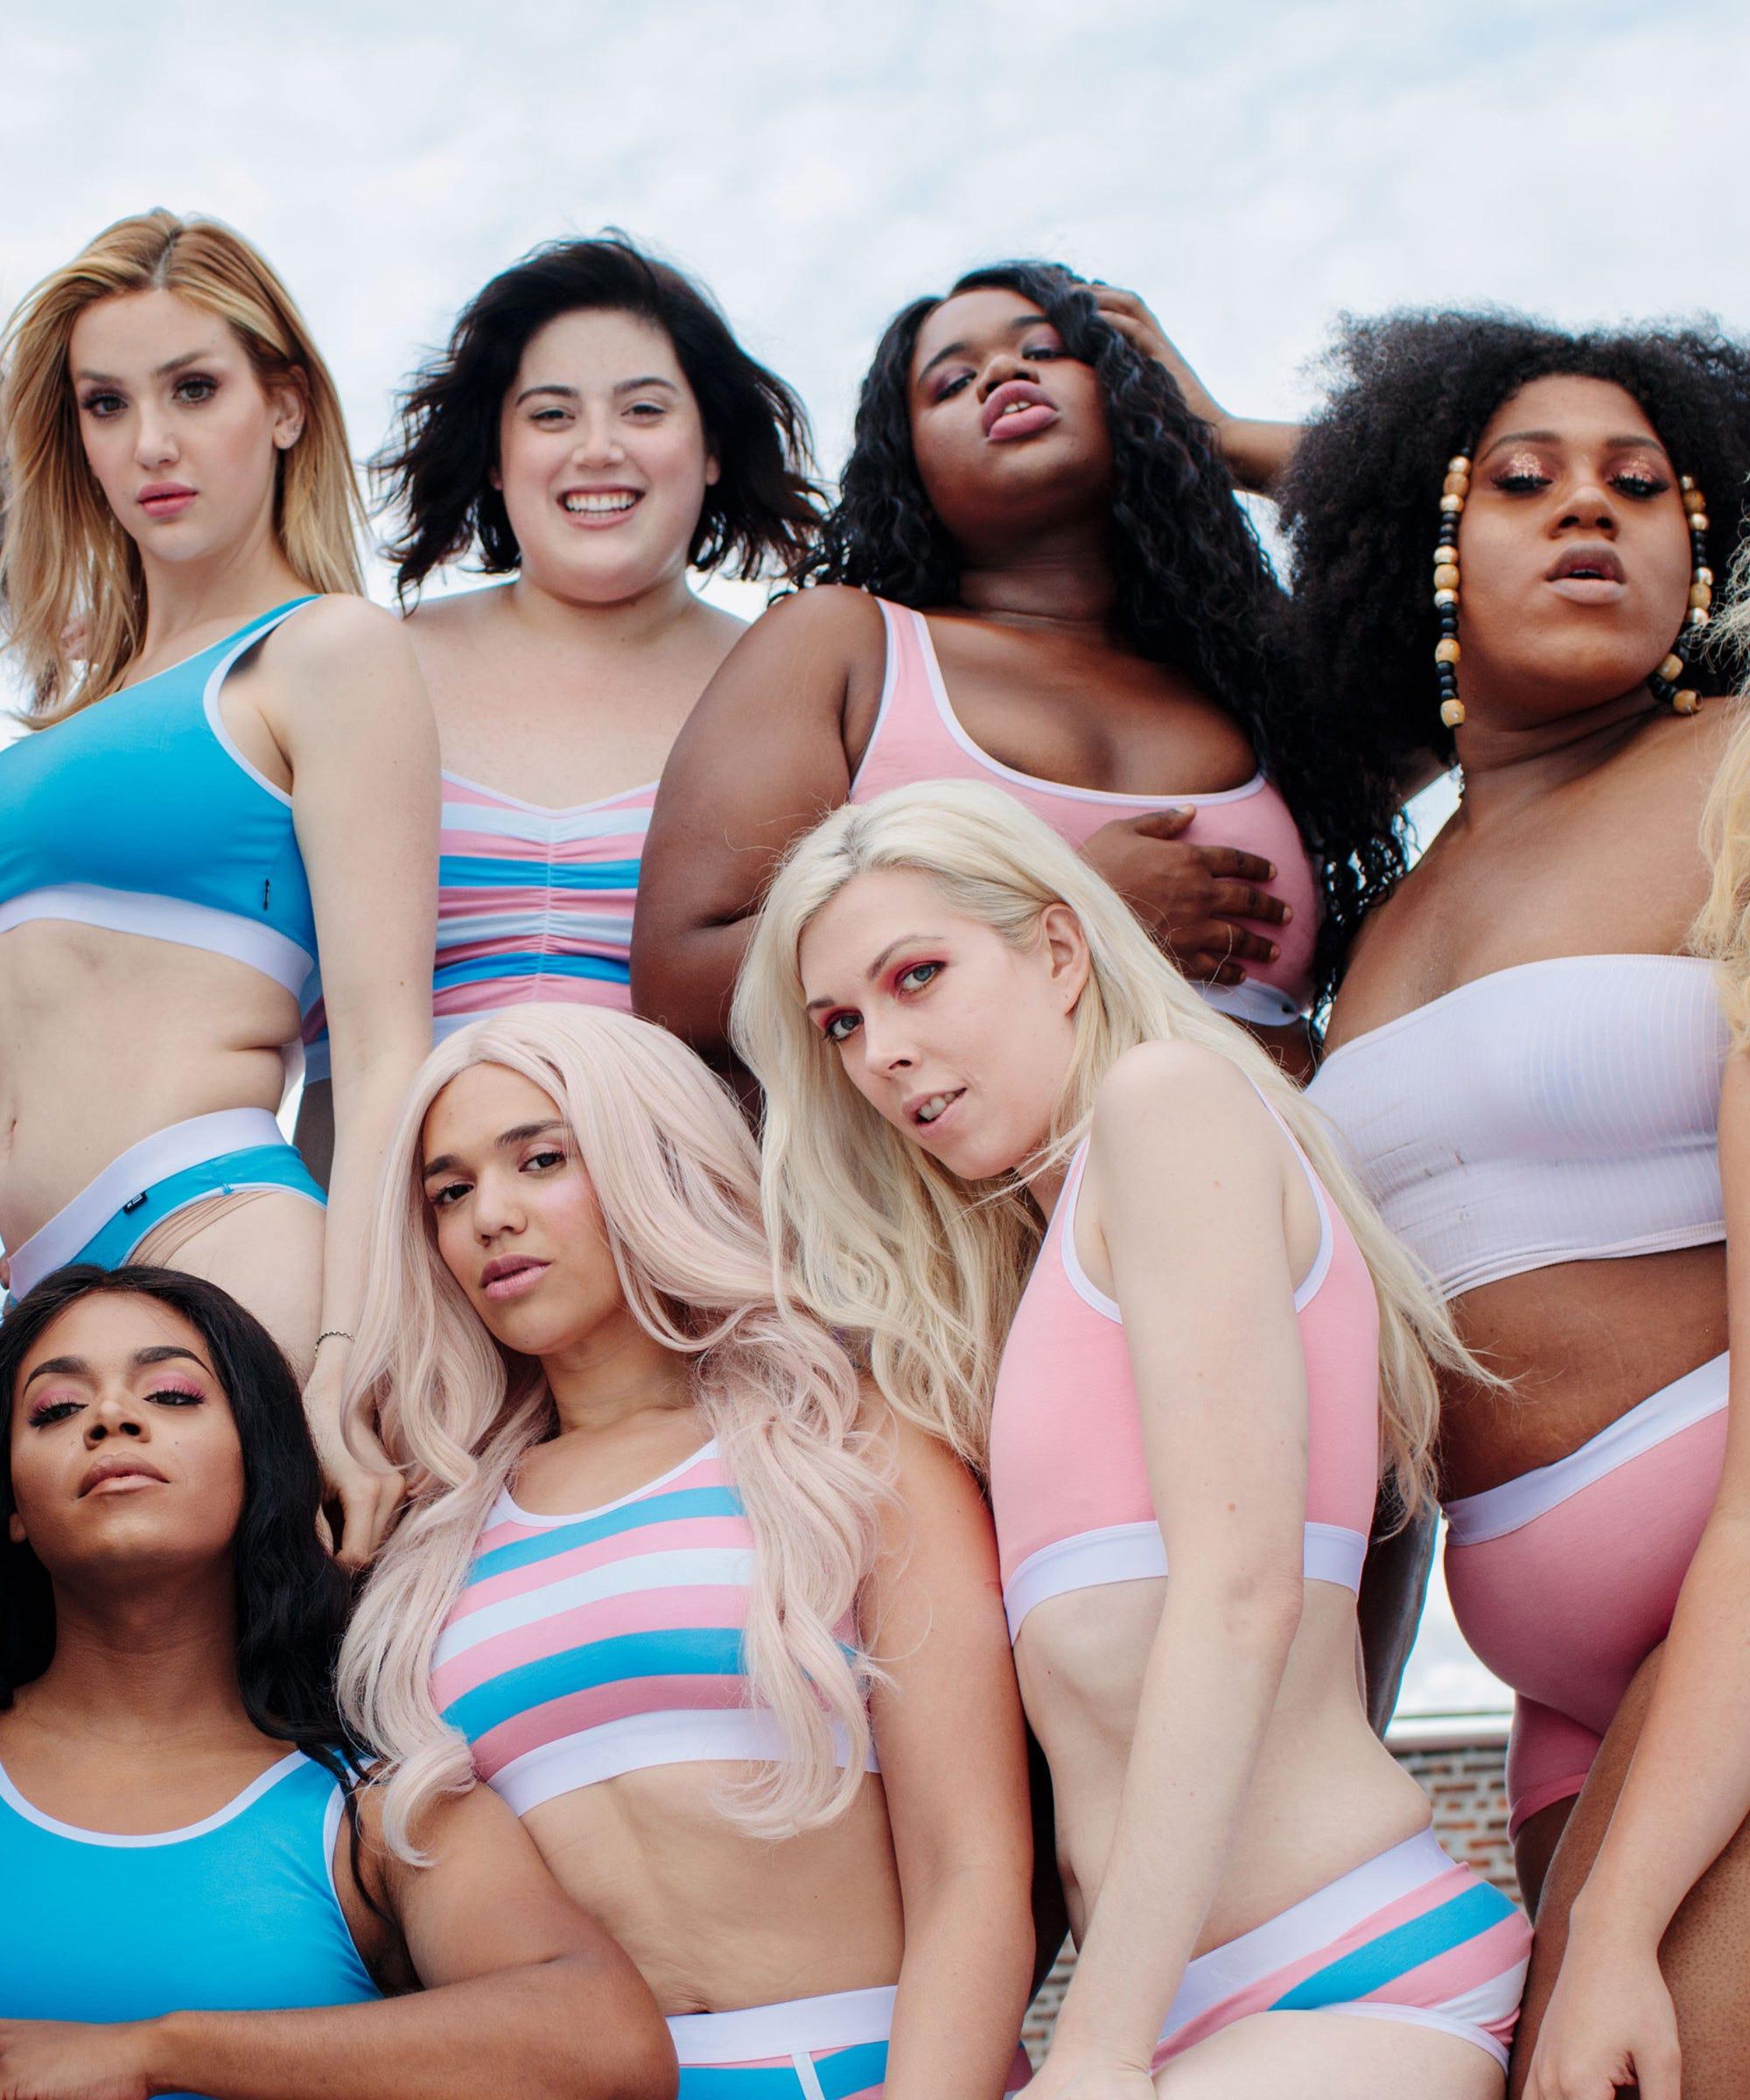 These Joyful Photos Celebrate The Beauty Of Trans Women